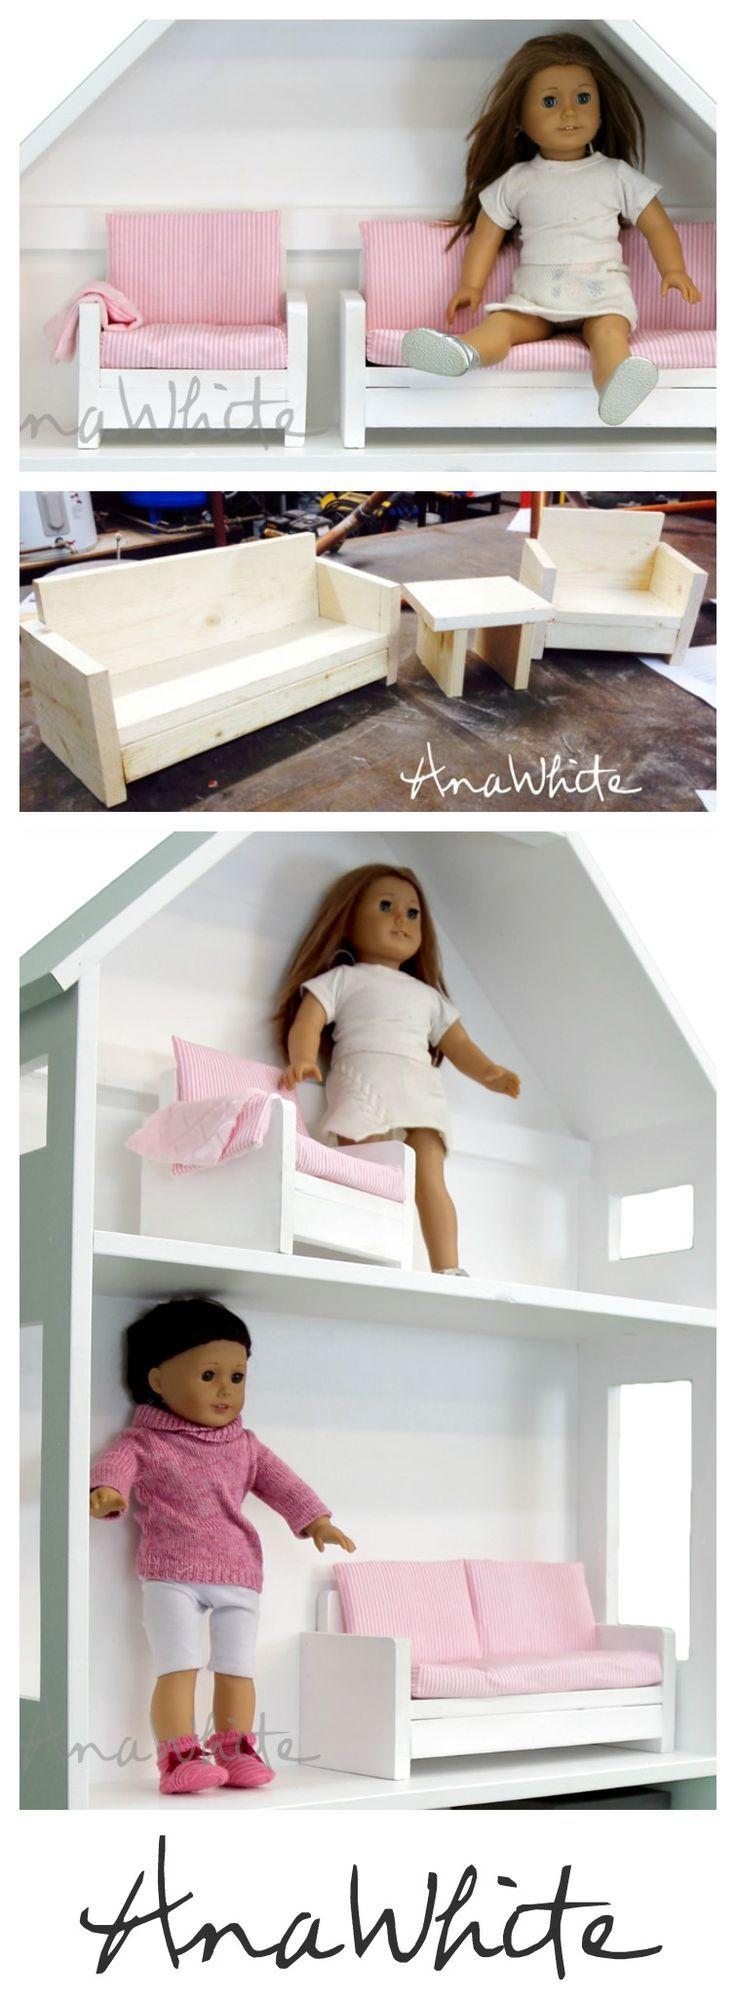 Unique present for girl  - nice photo #americangirlhouse